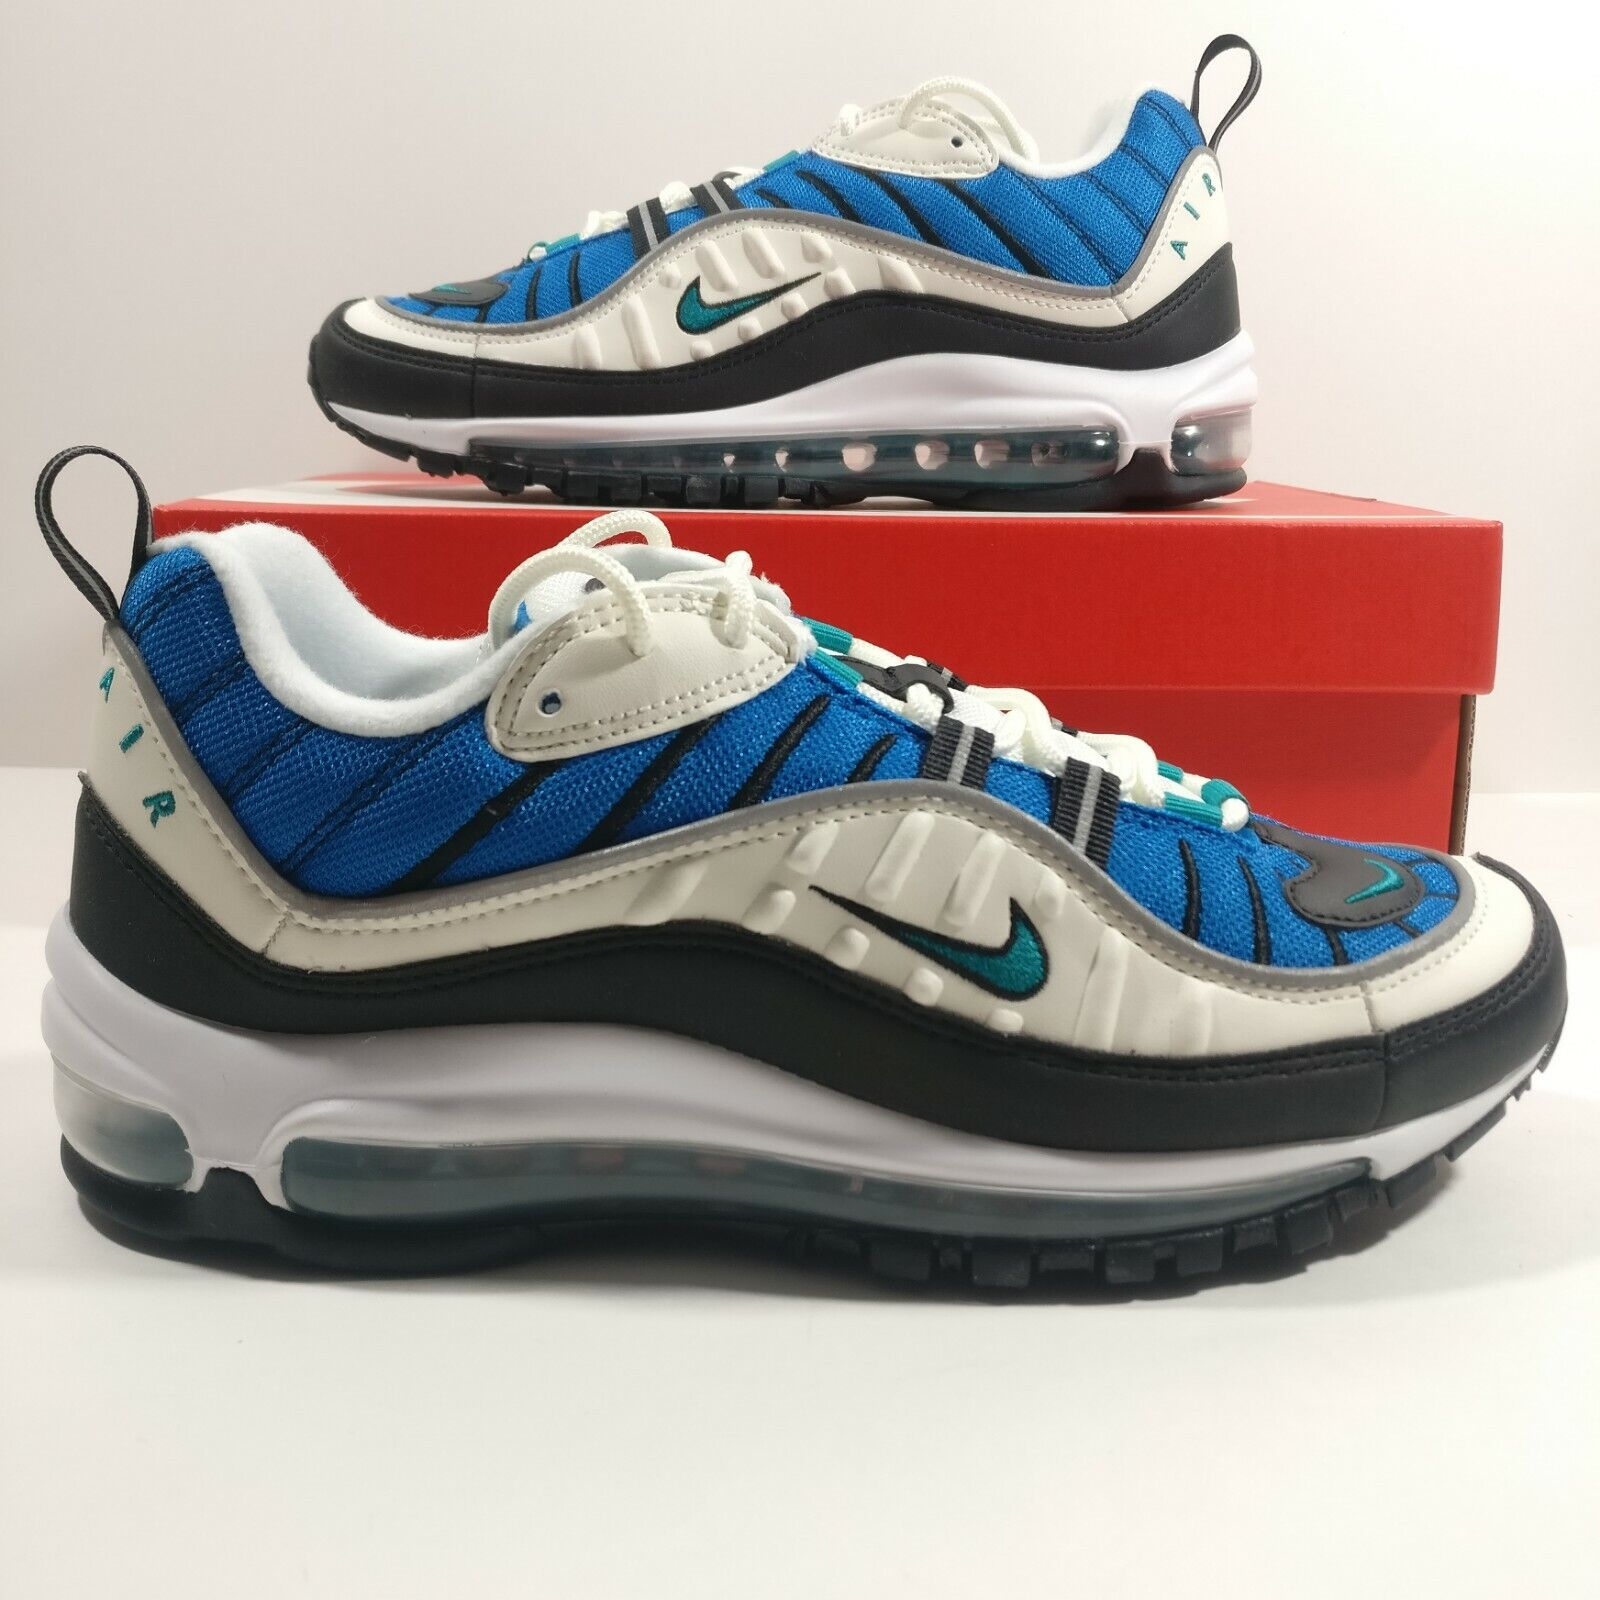 kvinnor Nike Air Max 98 blå Nebula Emerald springaning skor skor skor AH6799 -106 Multi Storlek  100% autentisk